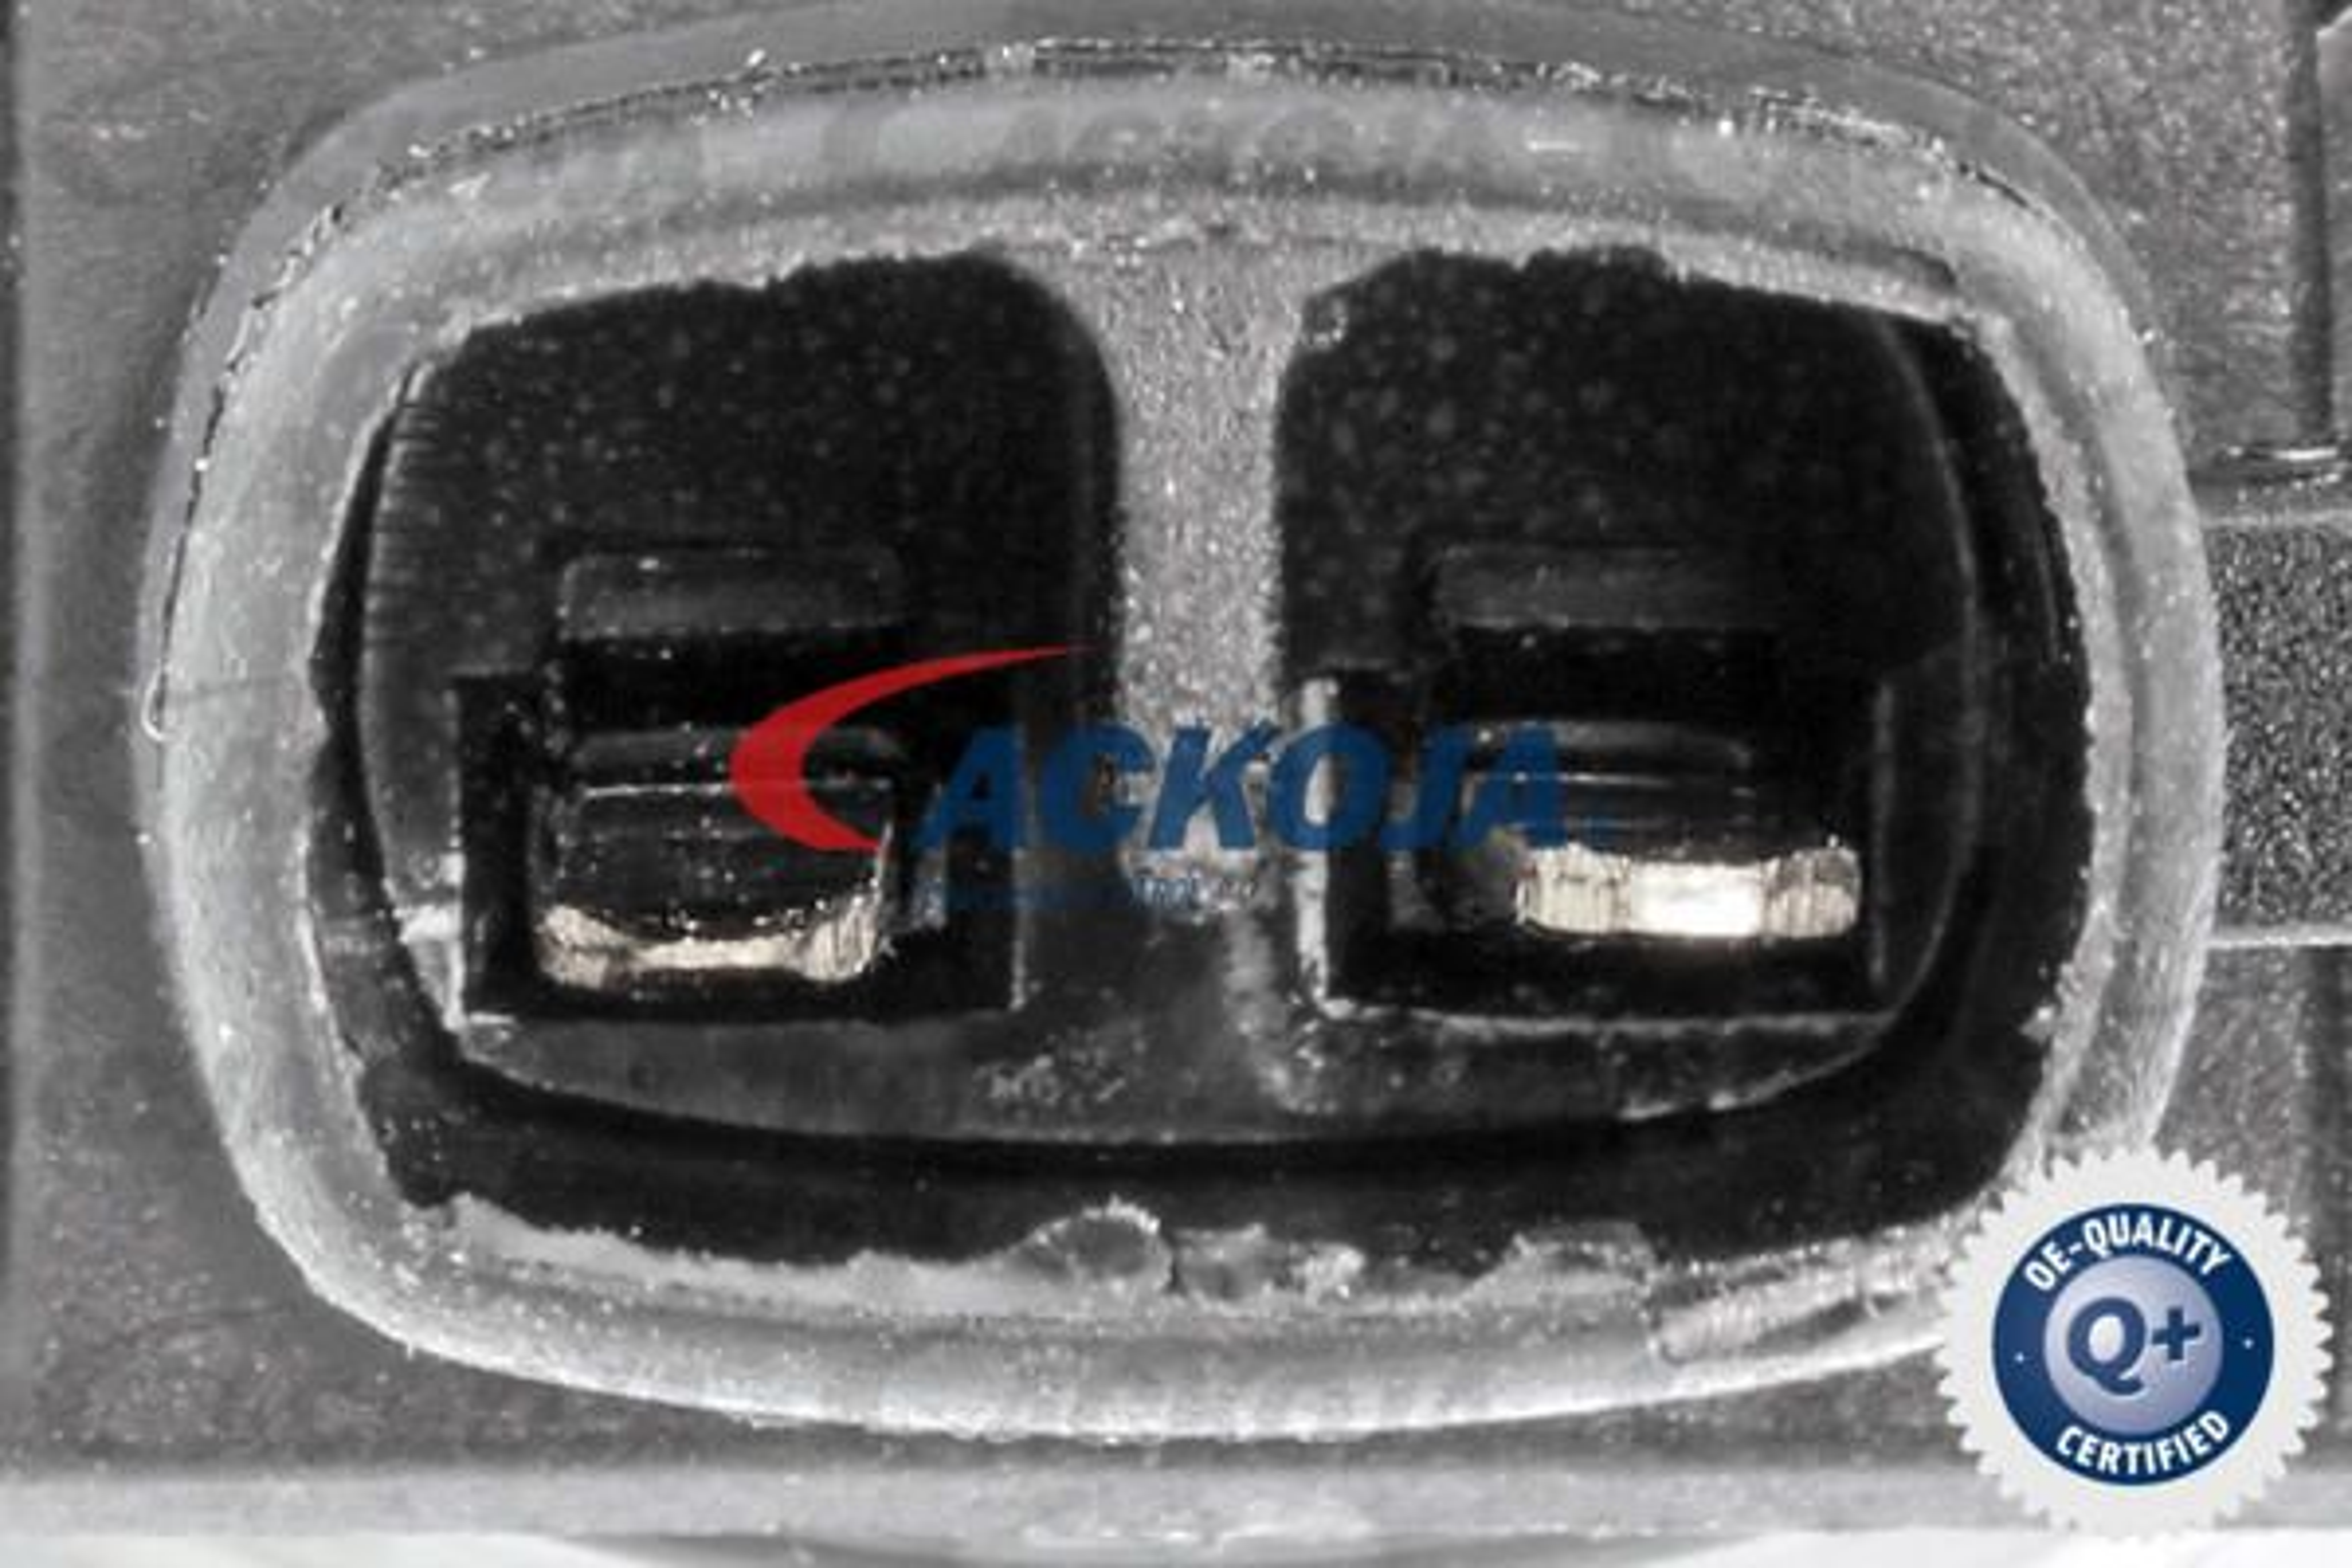 Scheibenwaschpumpe ACKOJA A51-08-0002 Bewertung